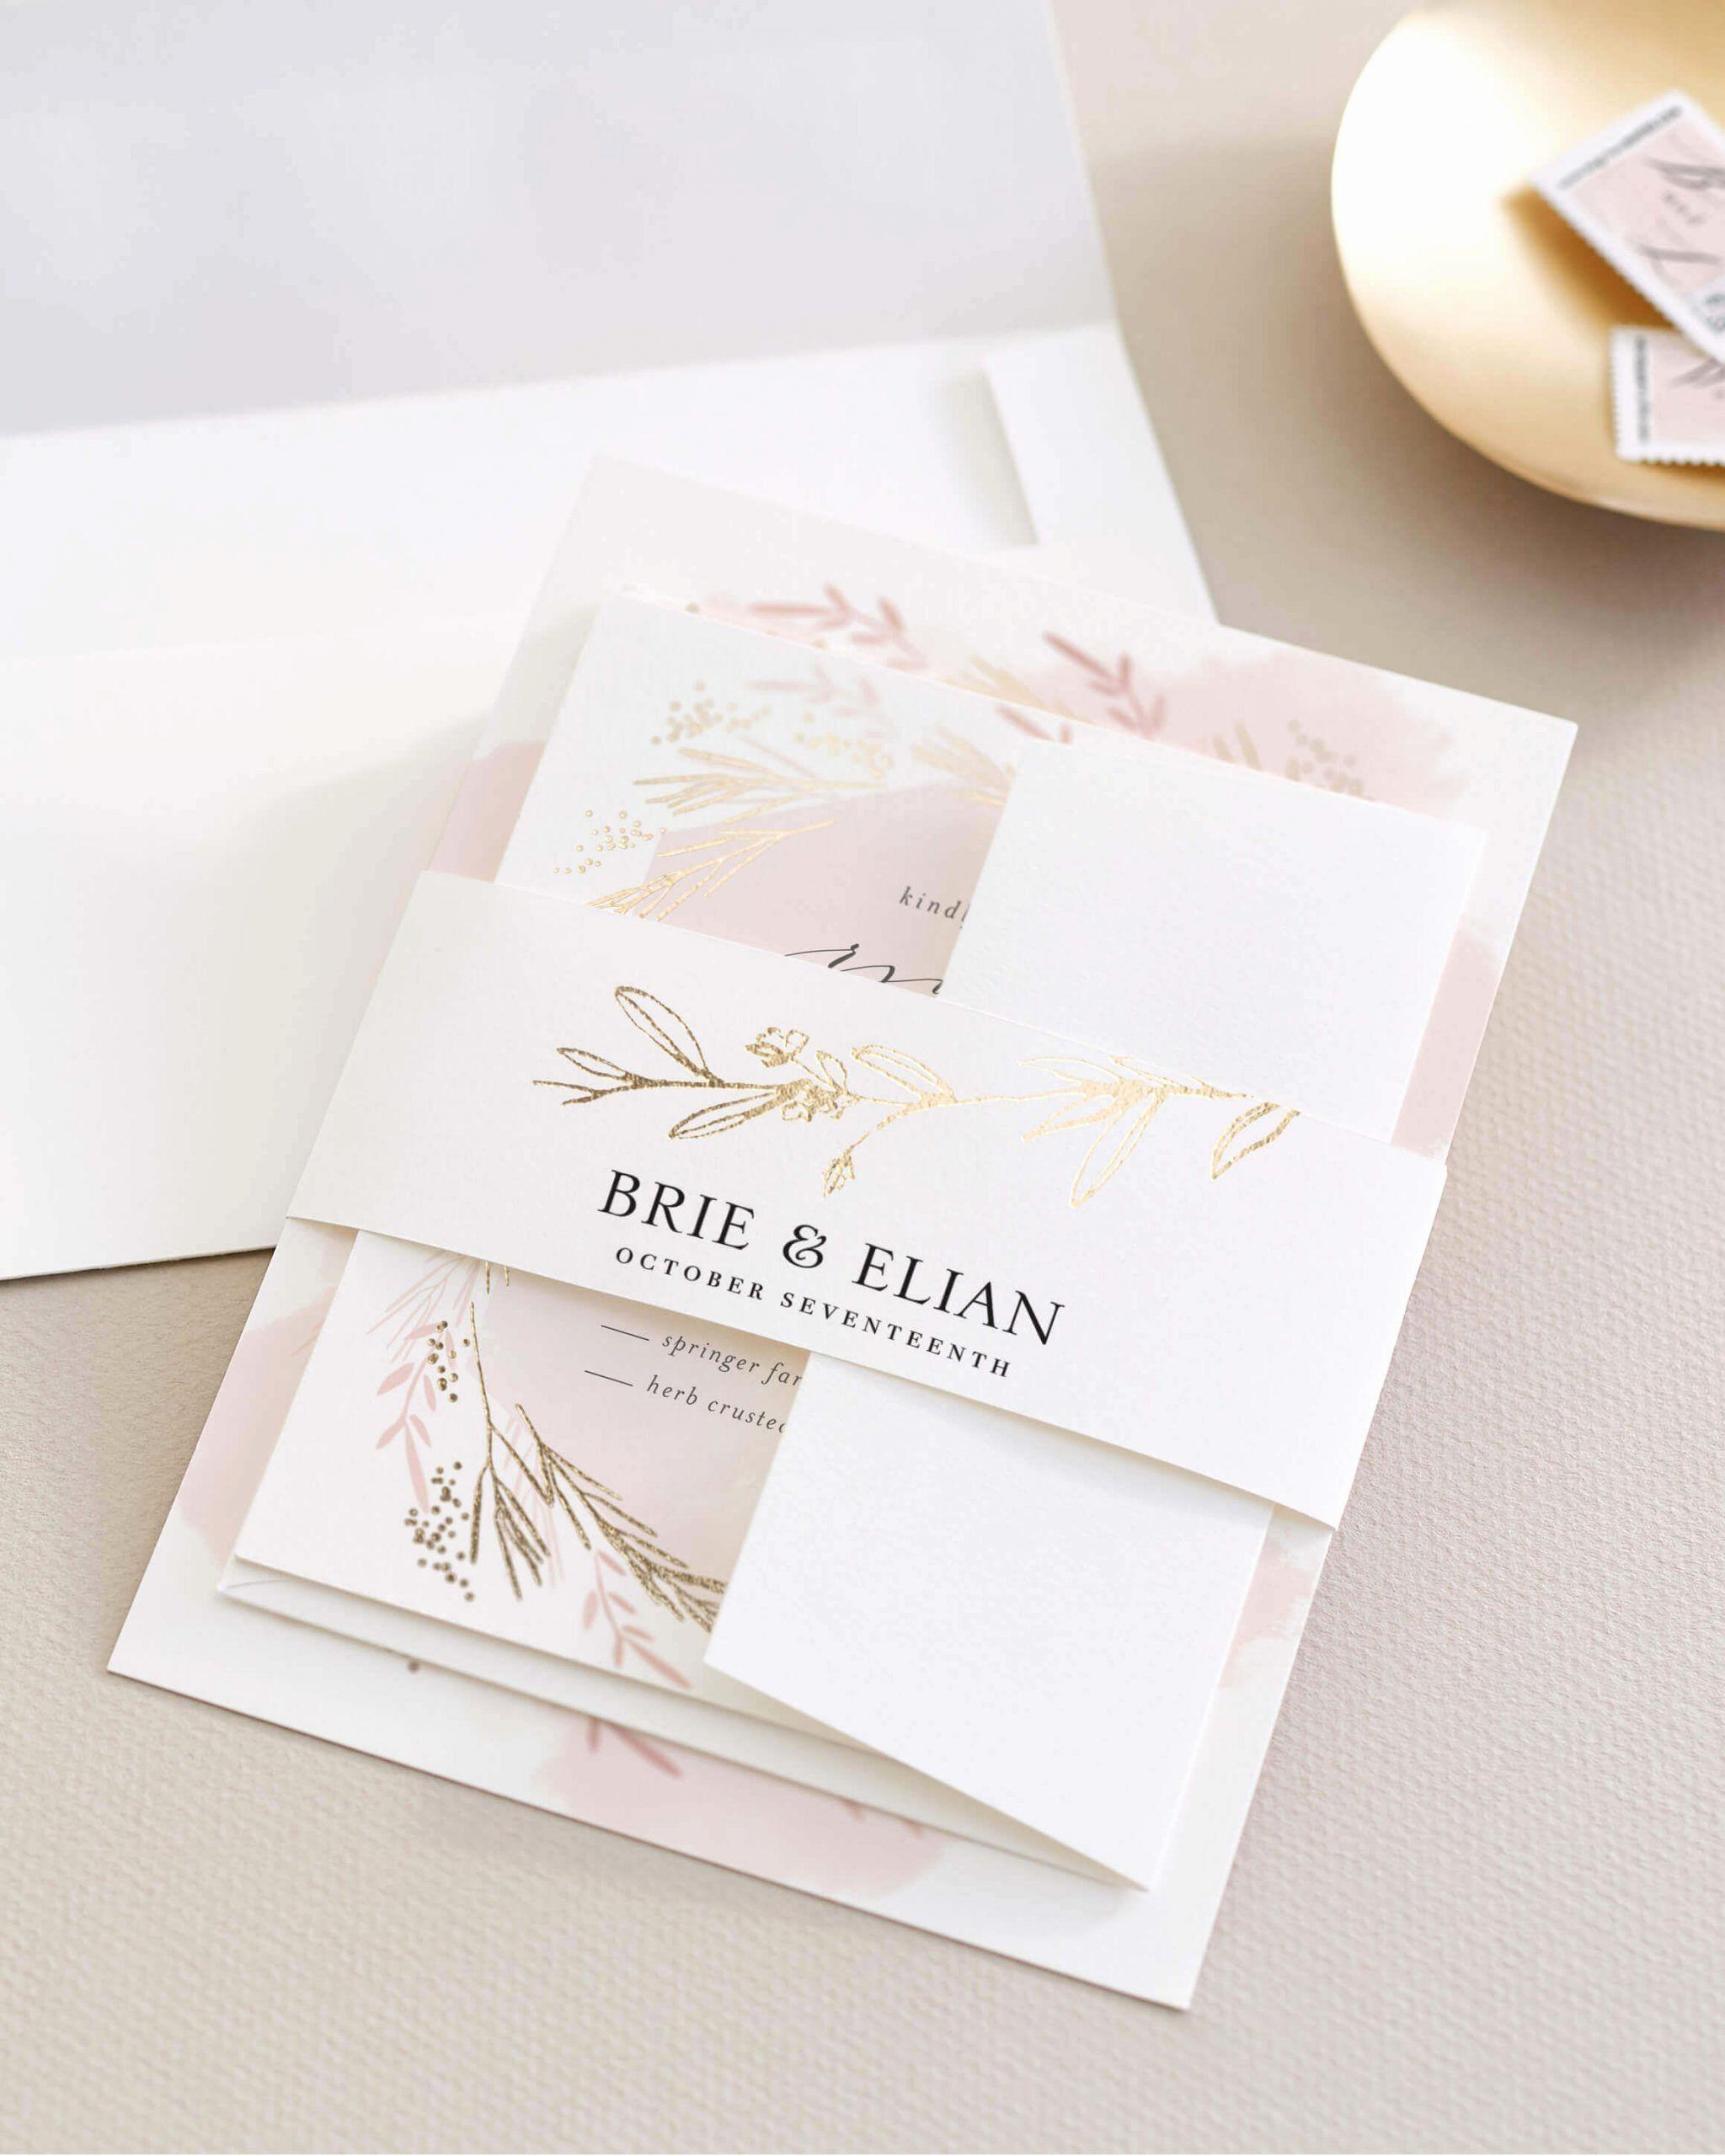 Brides Premium Invitation Kit Target Fresh Assembling Wedding Invitations In 2020 Minted Wedding Invitations Assembling Wedding Invitations Beach Wedding Invitations